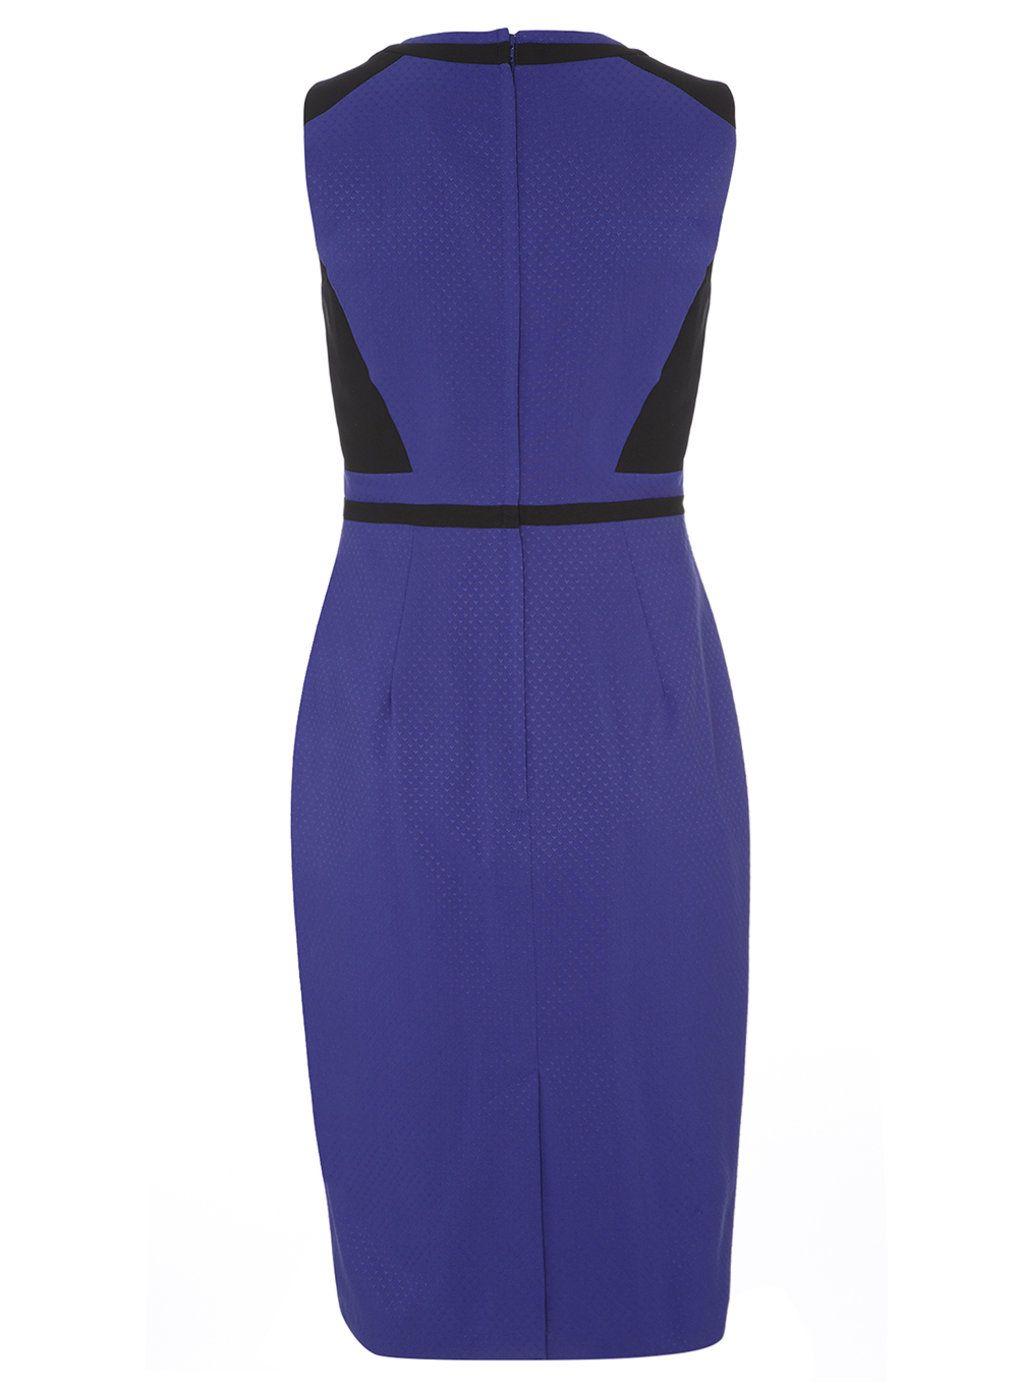 Tall Cobalt and Black Pencil Dress - Dorothy Perkins